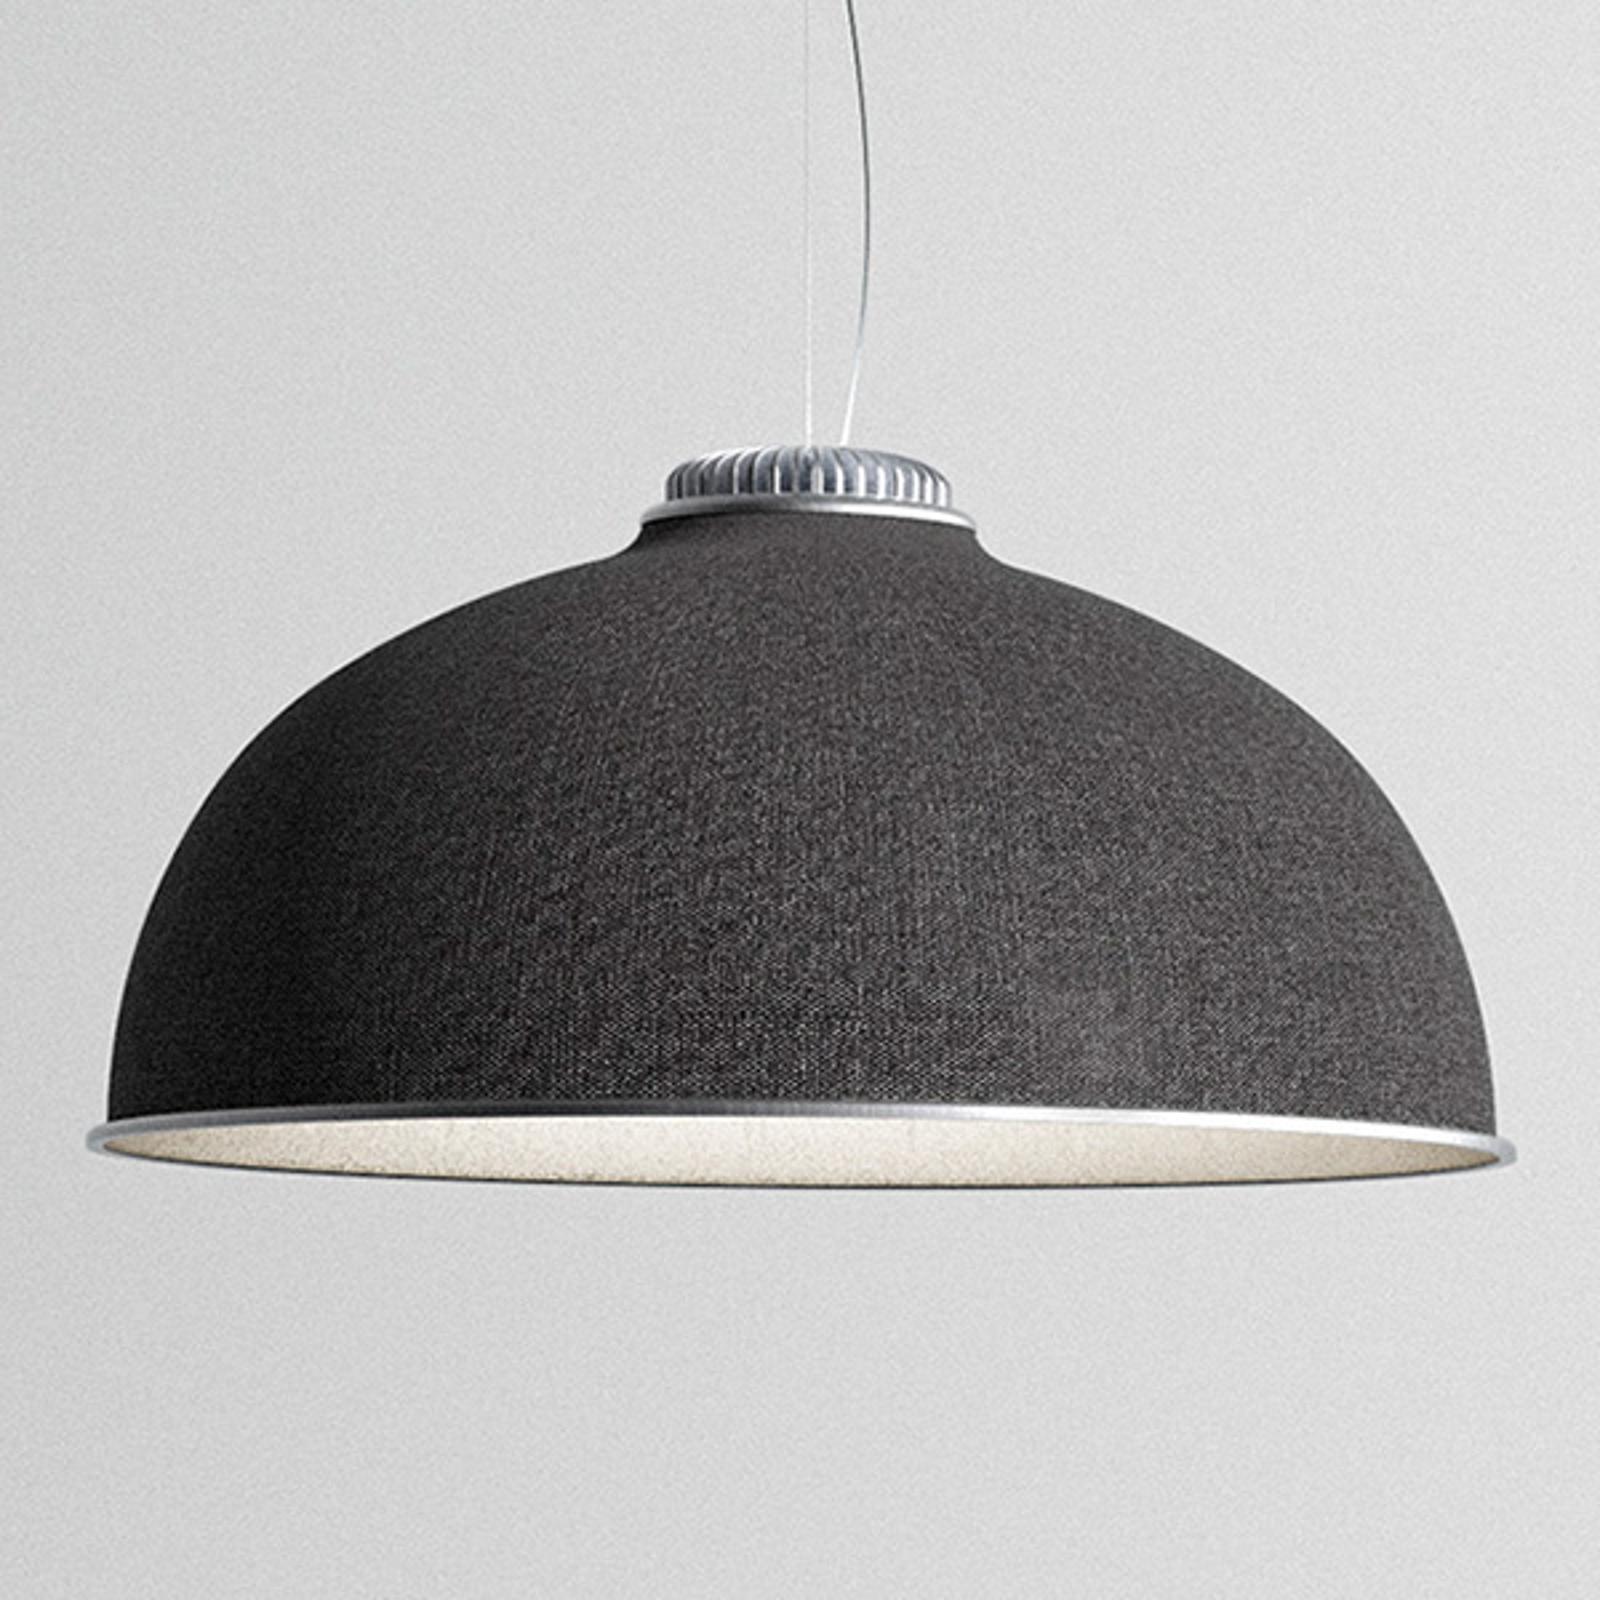 Luceplan Farel lampa wisząca LED klosz ciemnoszary